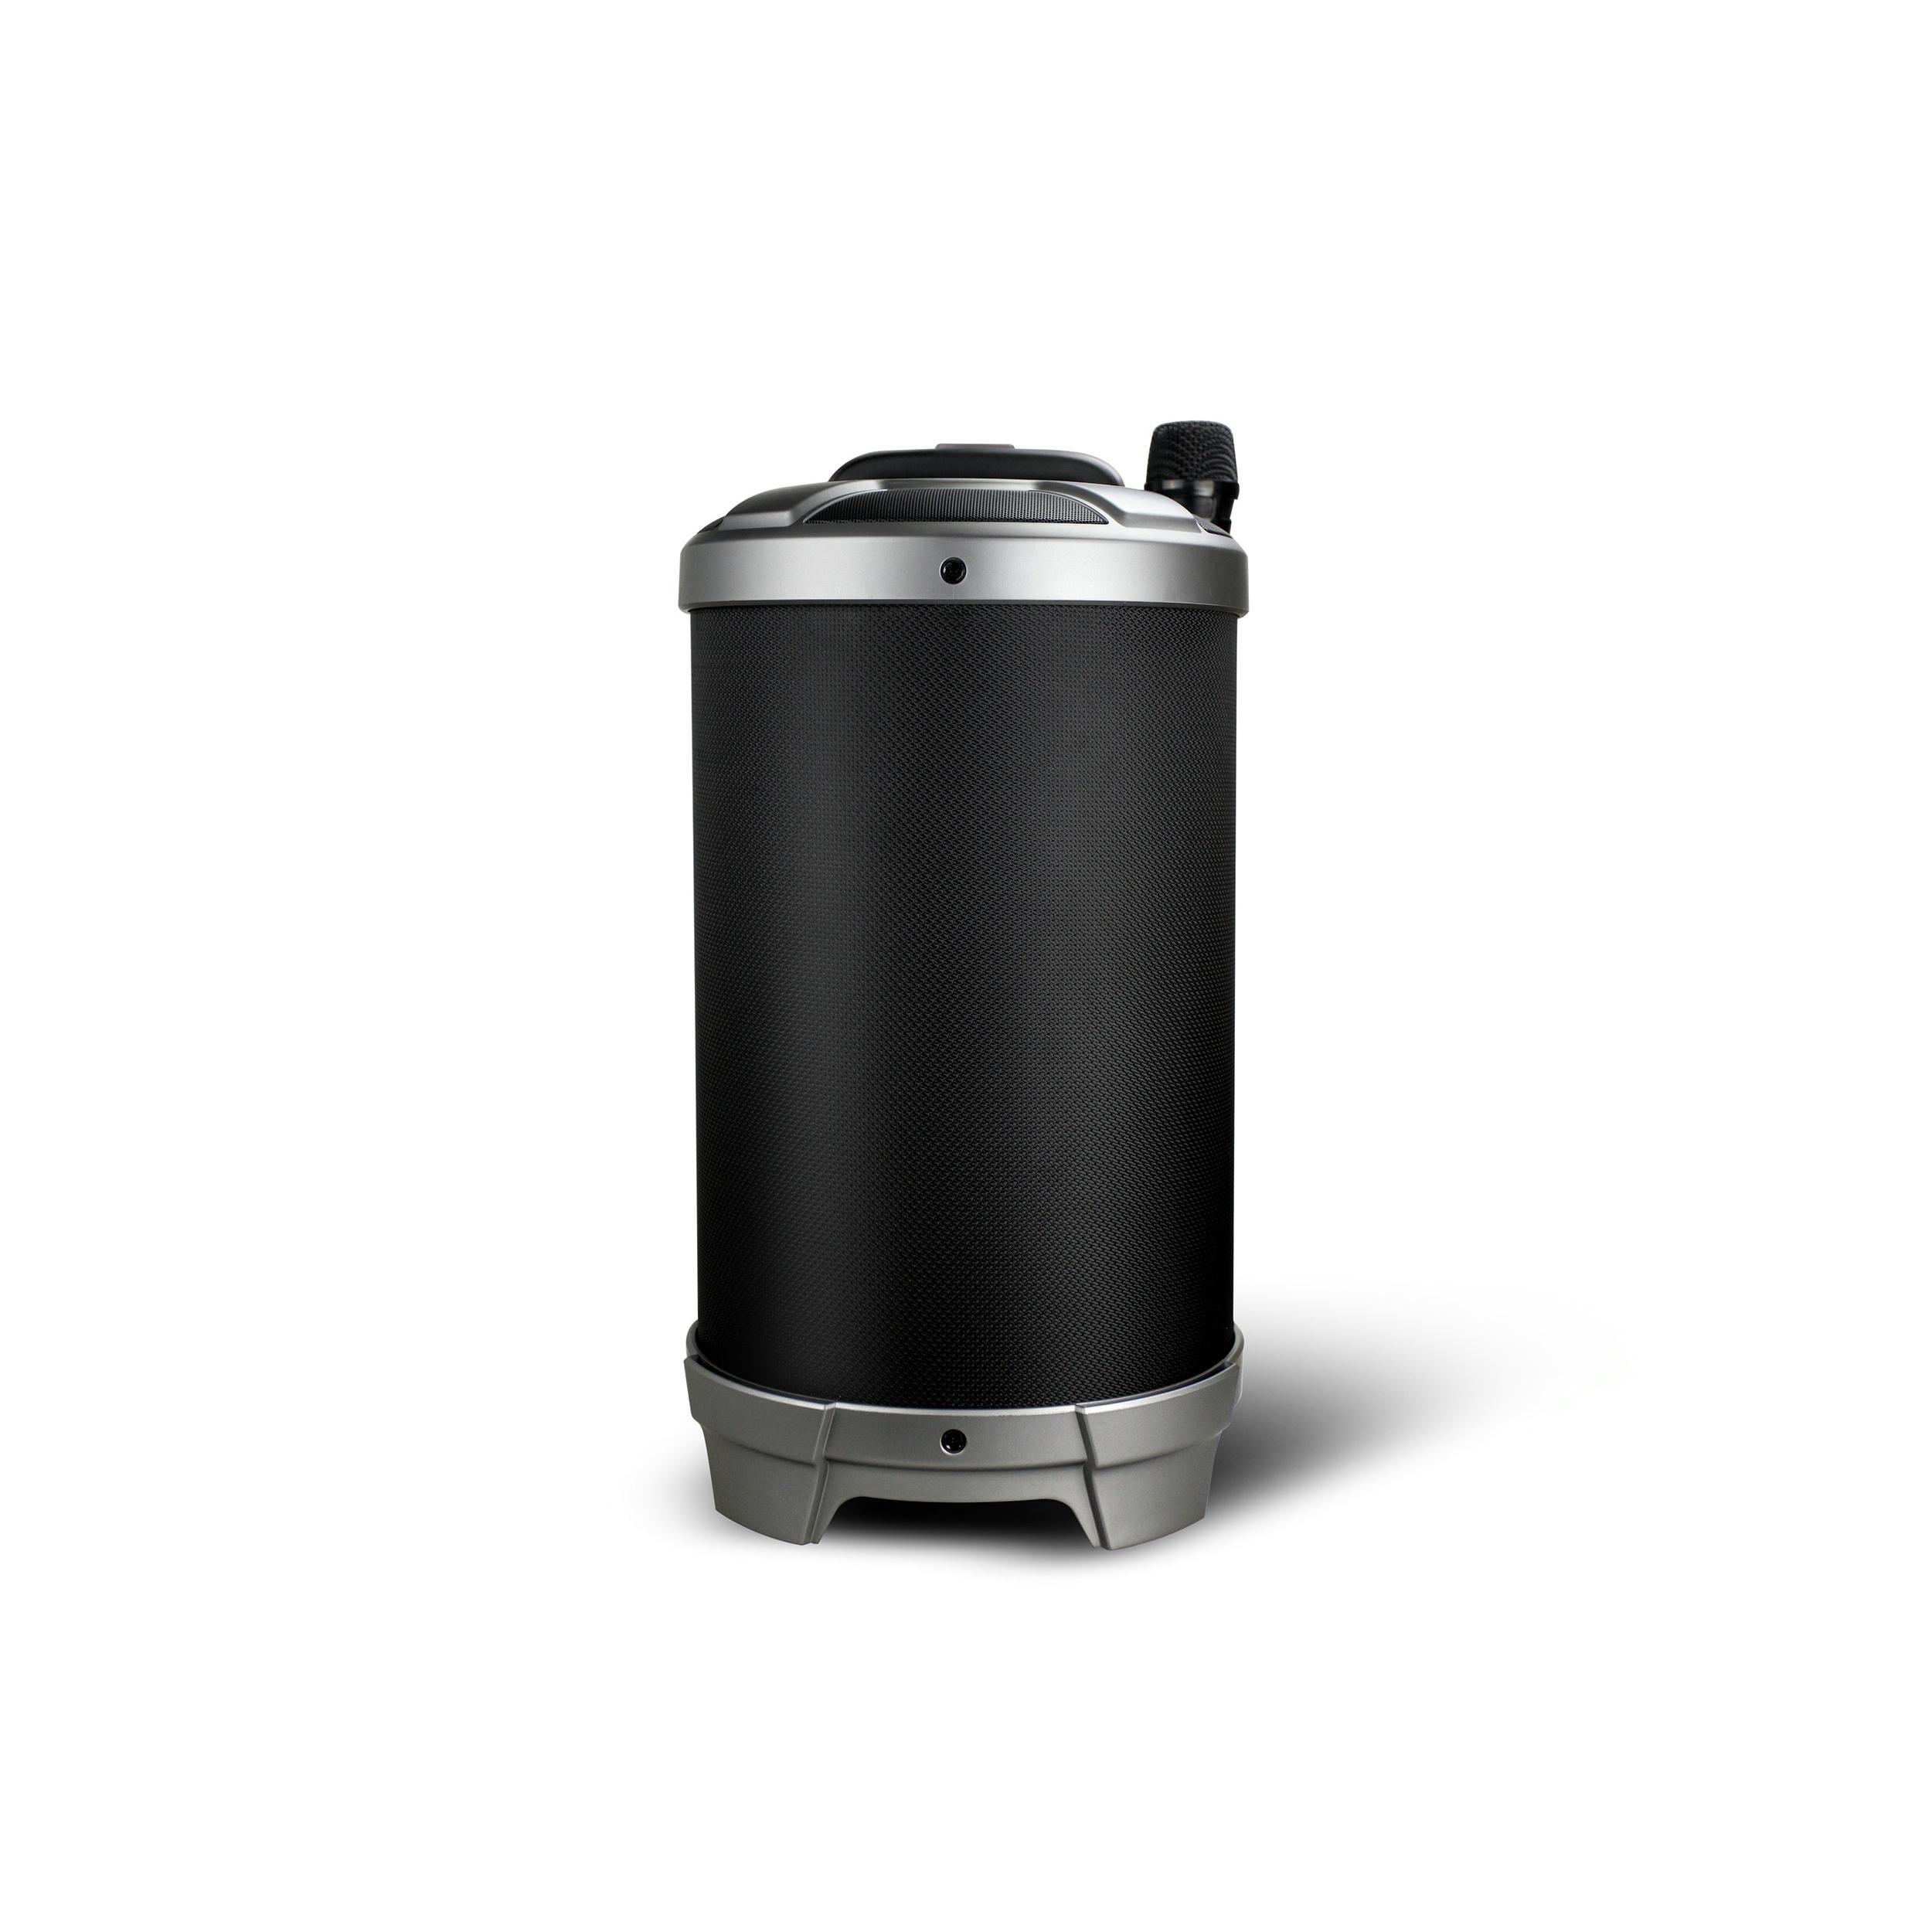 اسپیکر بلوتوثی قابل حمل بیکارو مدل S36